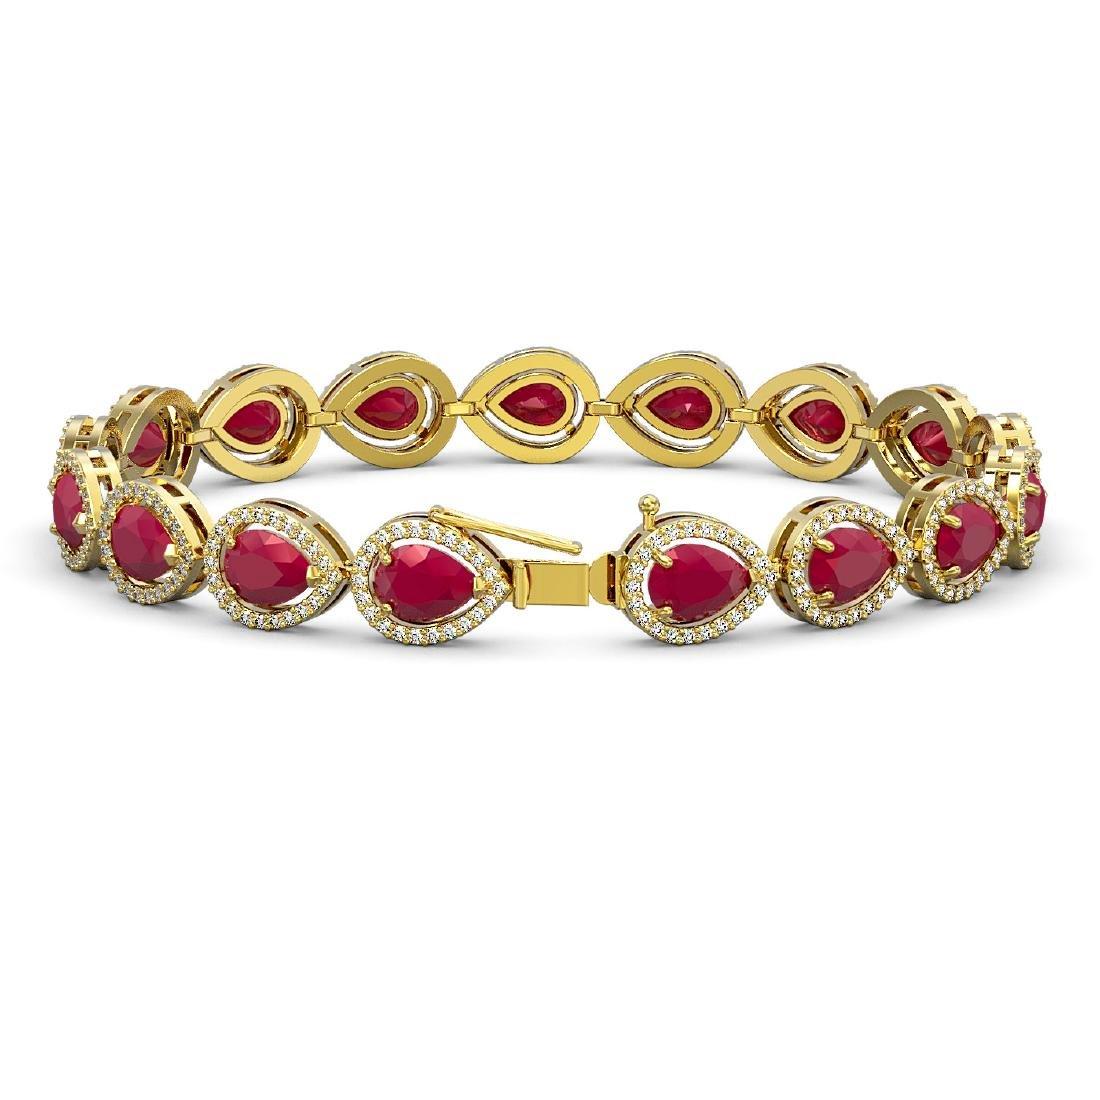 21.69 CTW Ruby & Diamond Halo Bracelet 10K Yellow Gold - 2